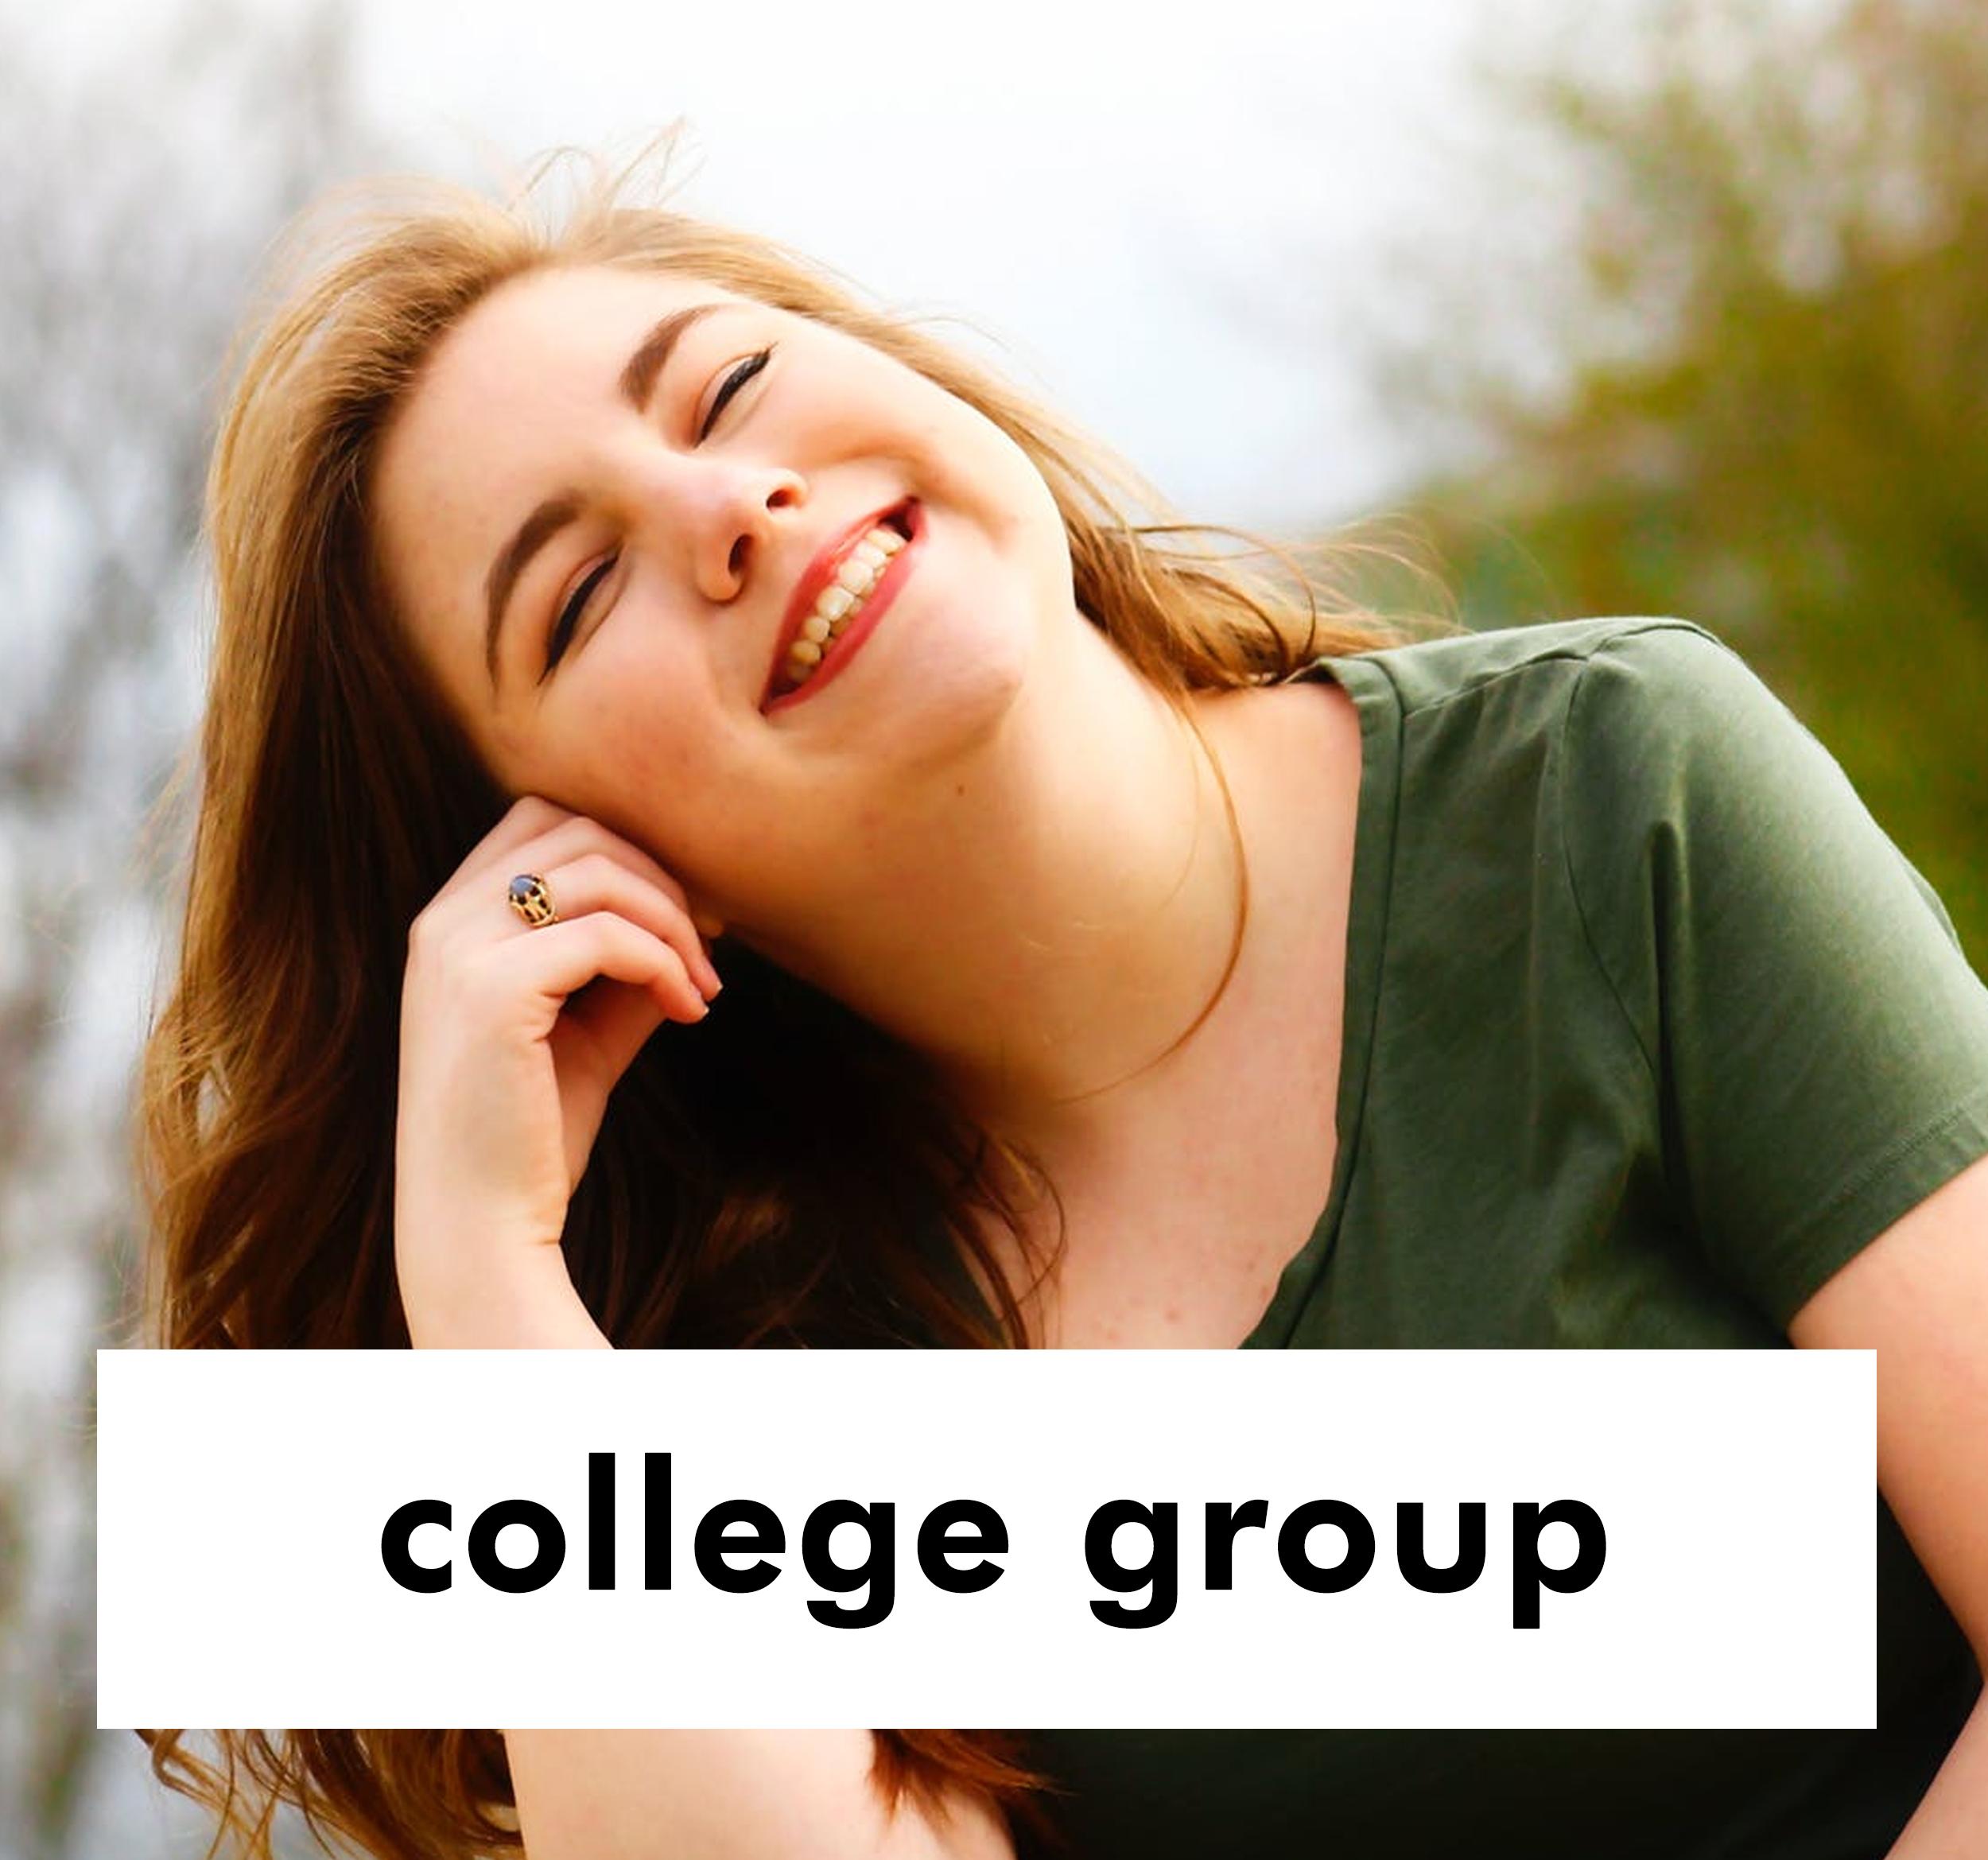 DBTcollegegroup